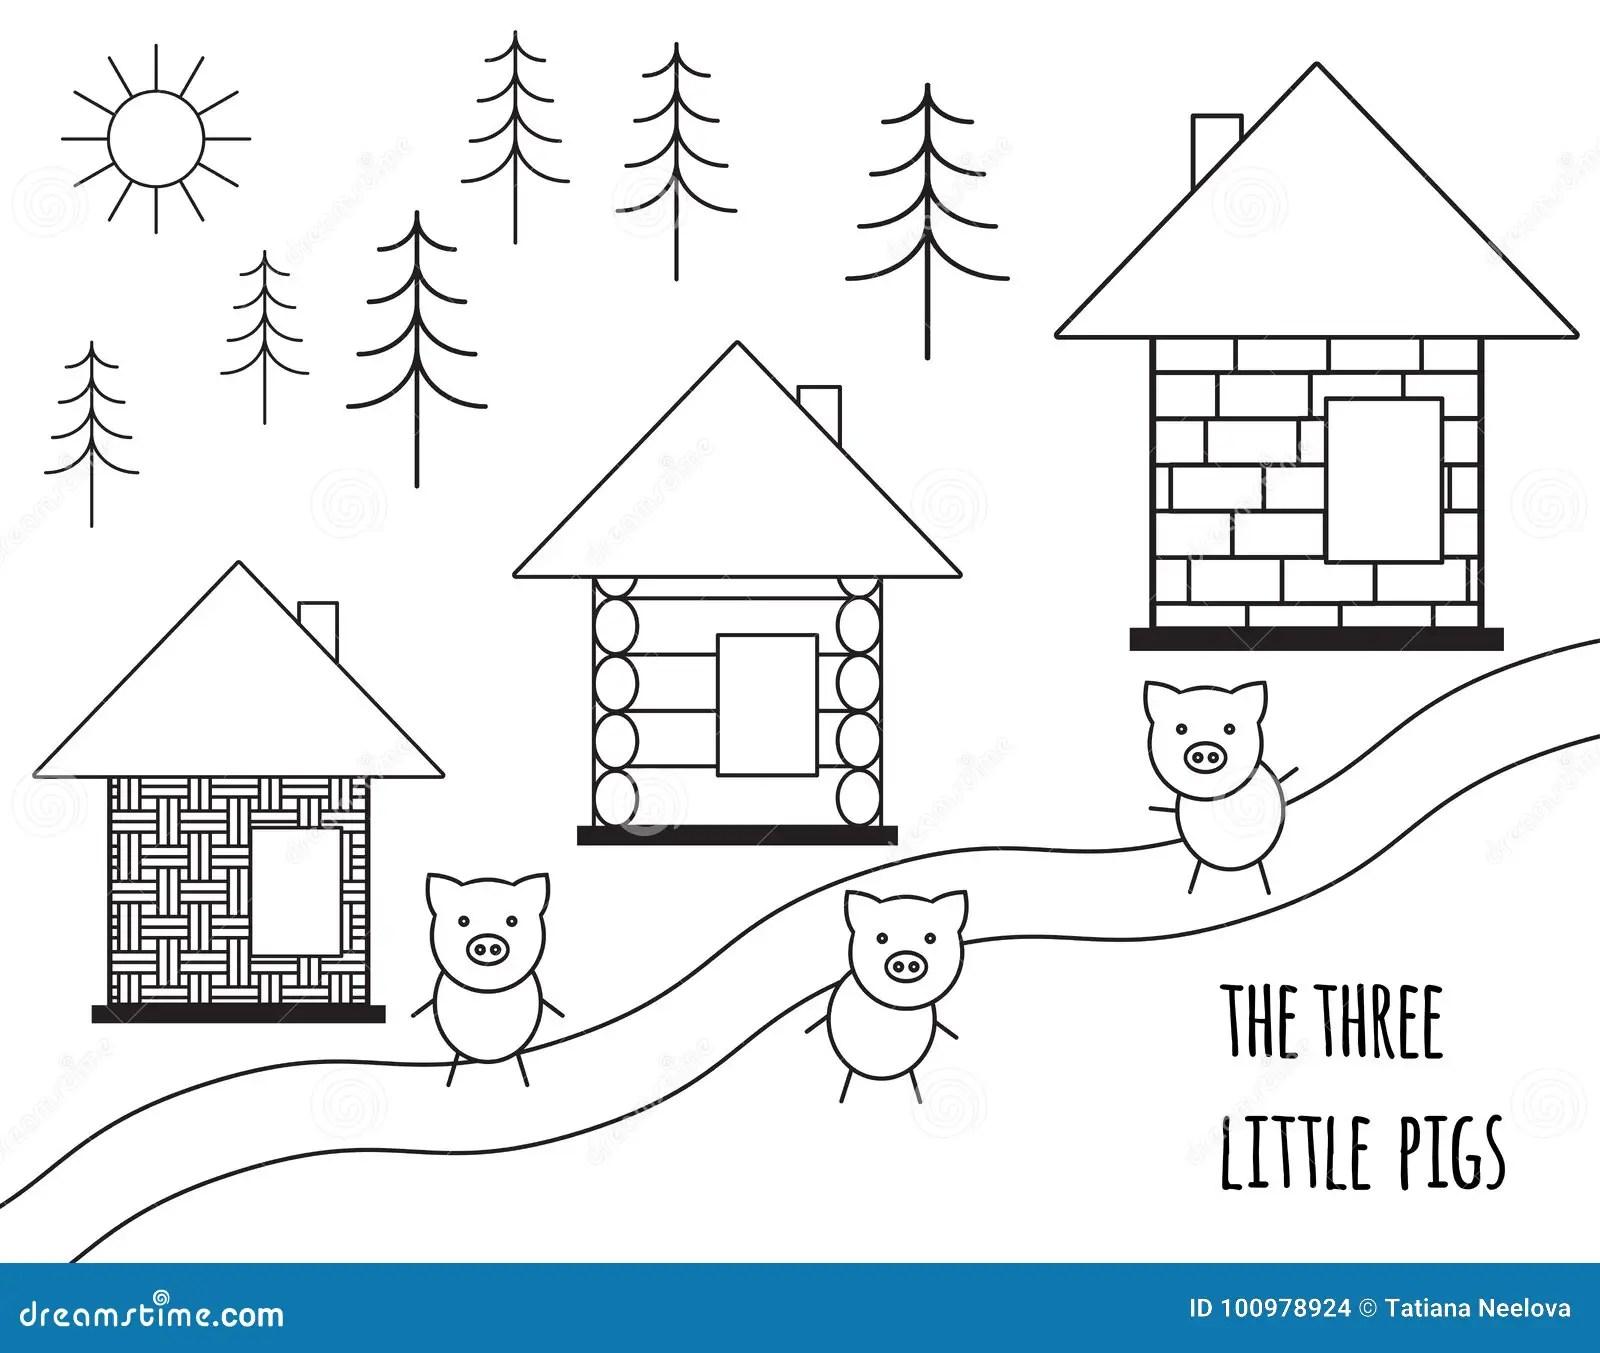 Three Little Pigs Fairy Tale Vector Illustration Isolated